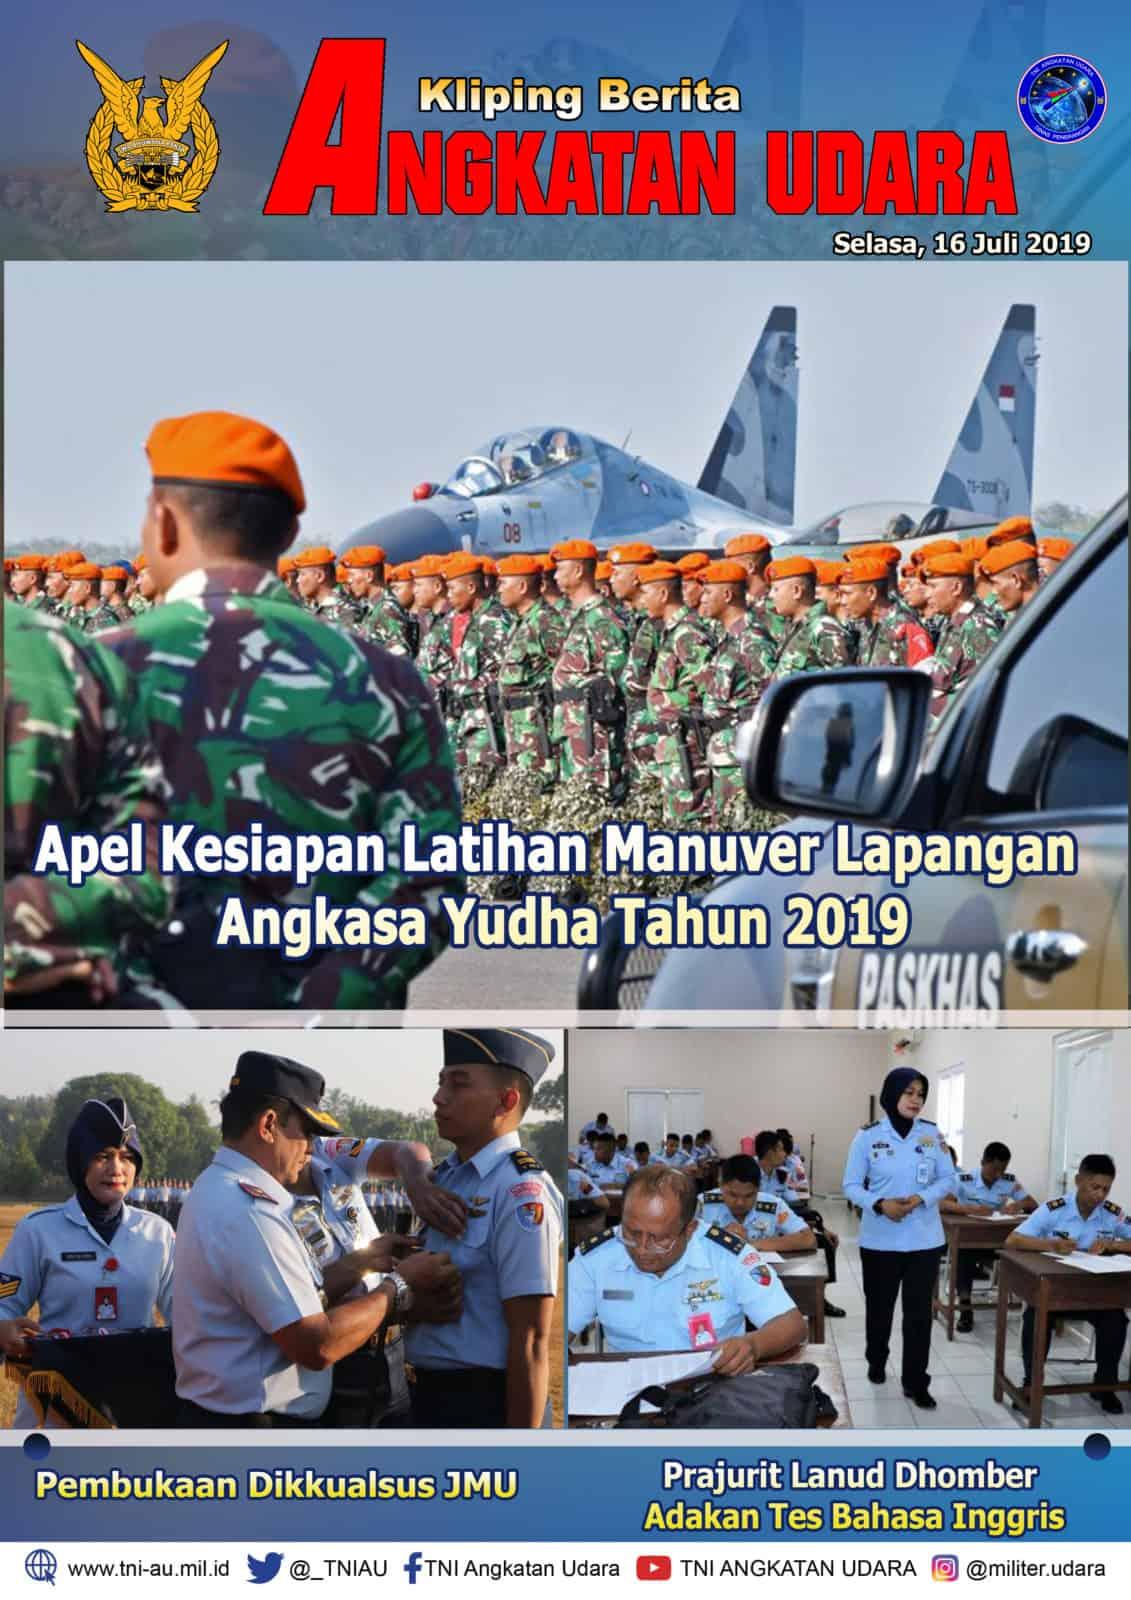 Kliping Berita Media 16 Juli 2019